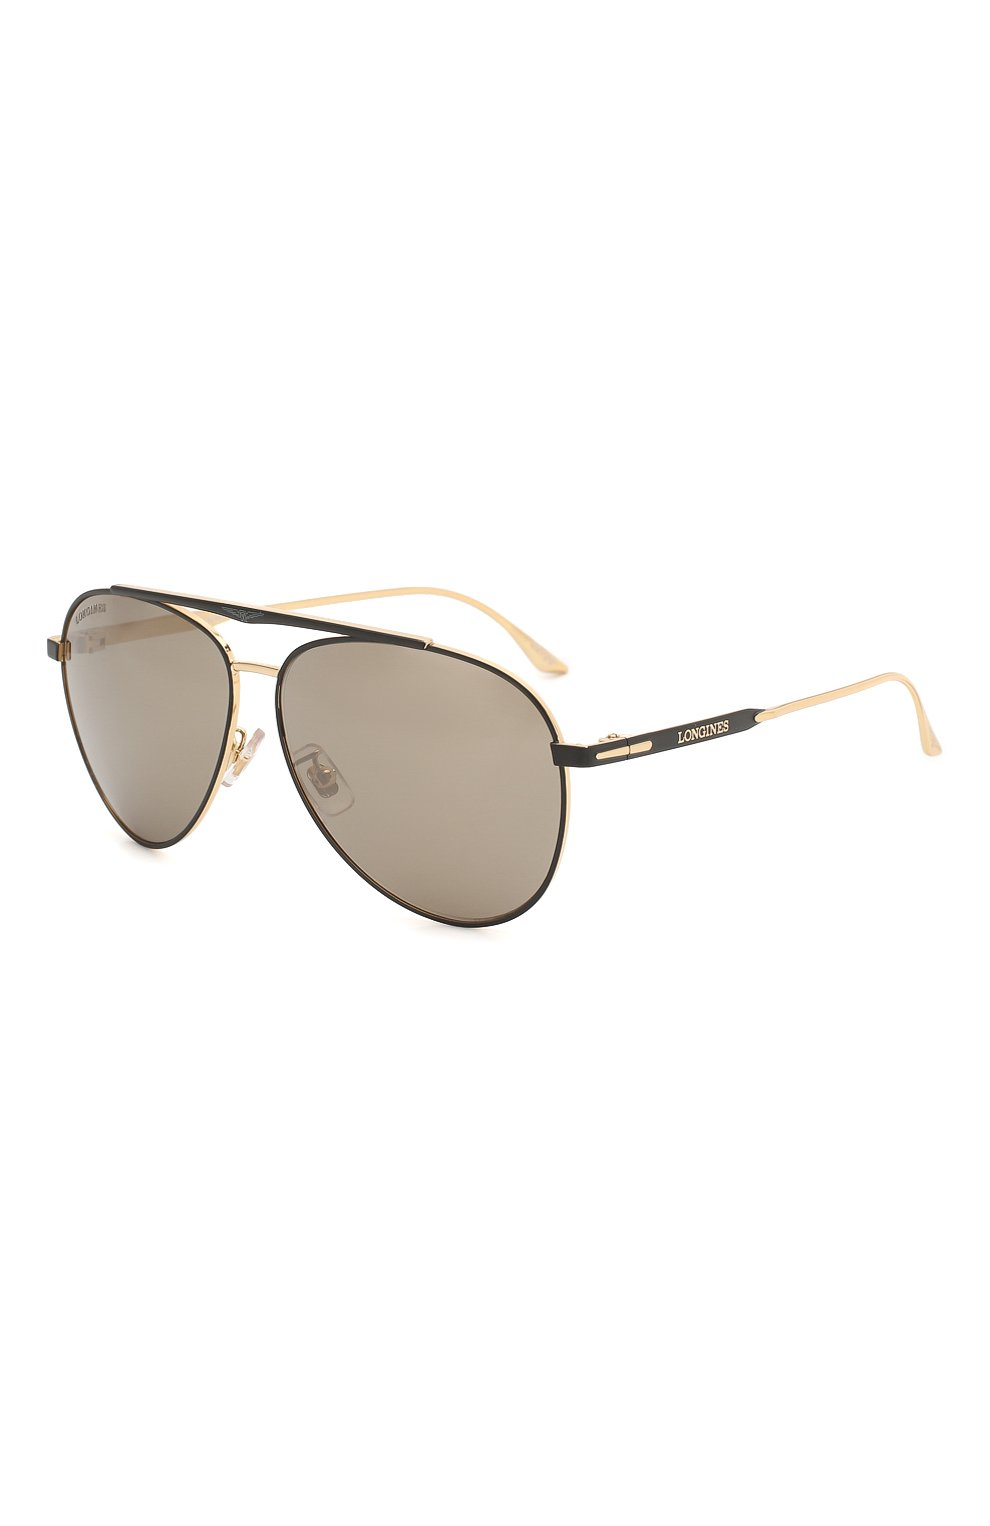 Мужские солнцезащитные очки LONGINES черного цвета, арт. LG0005-H 02L | Фото 1 (Тип очков: С/з; Очки форма: Авиаторы; Оптика Гендер: оптика-мужское)